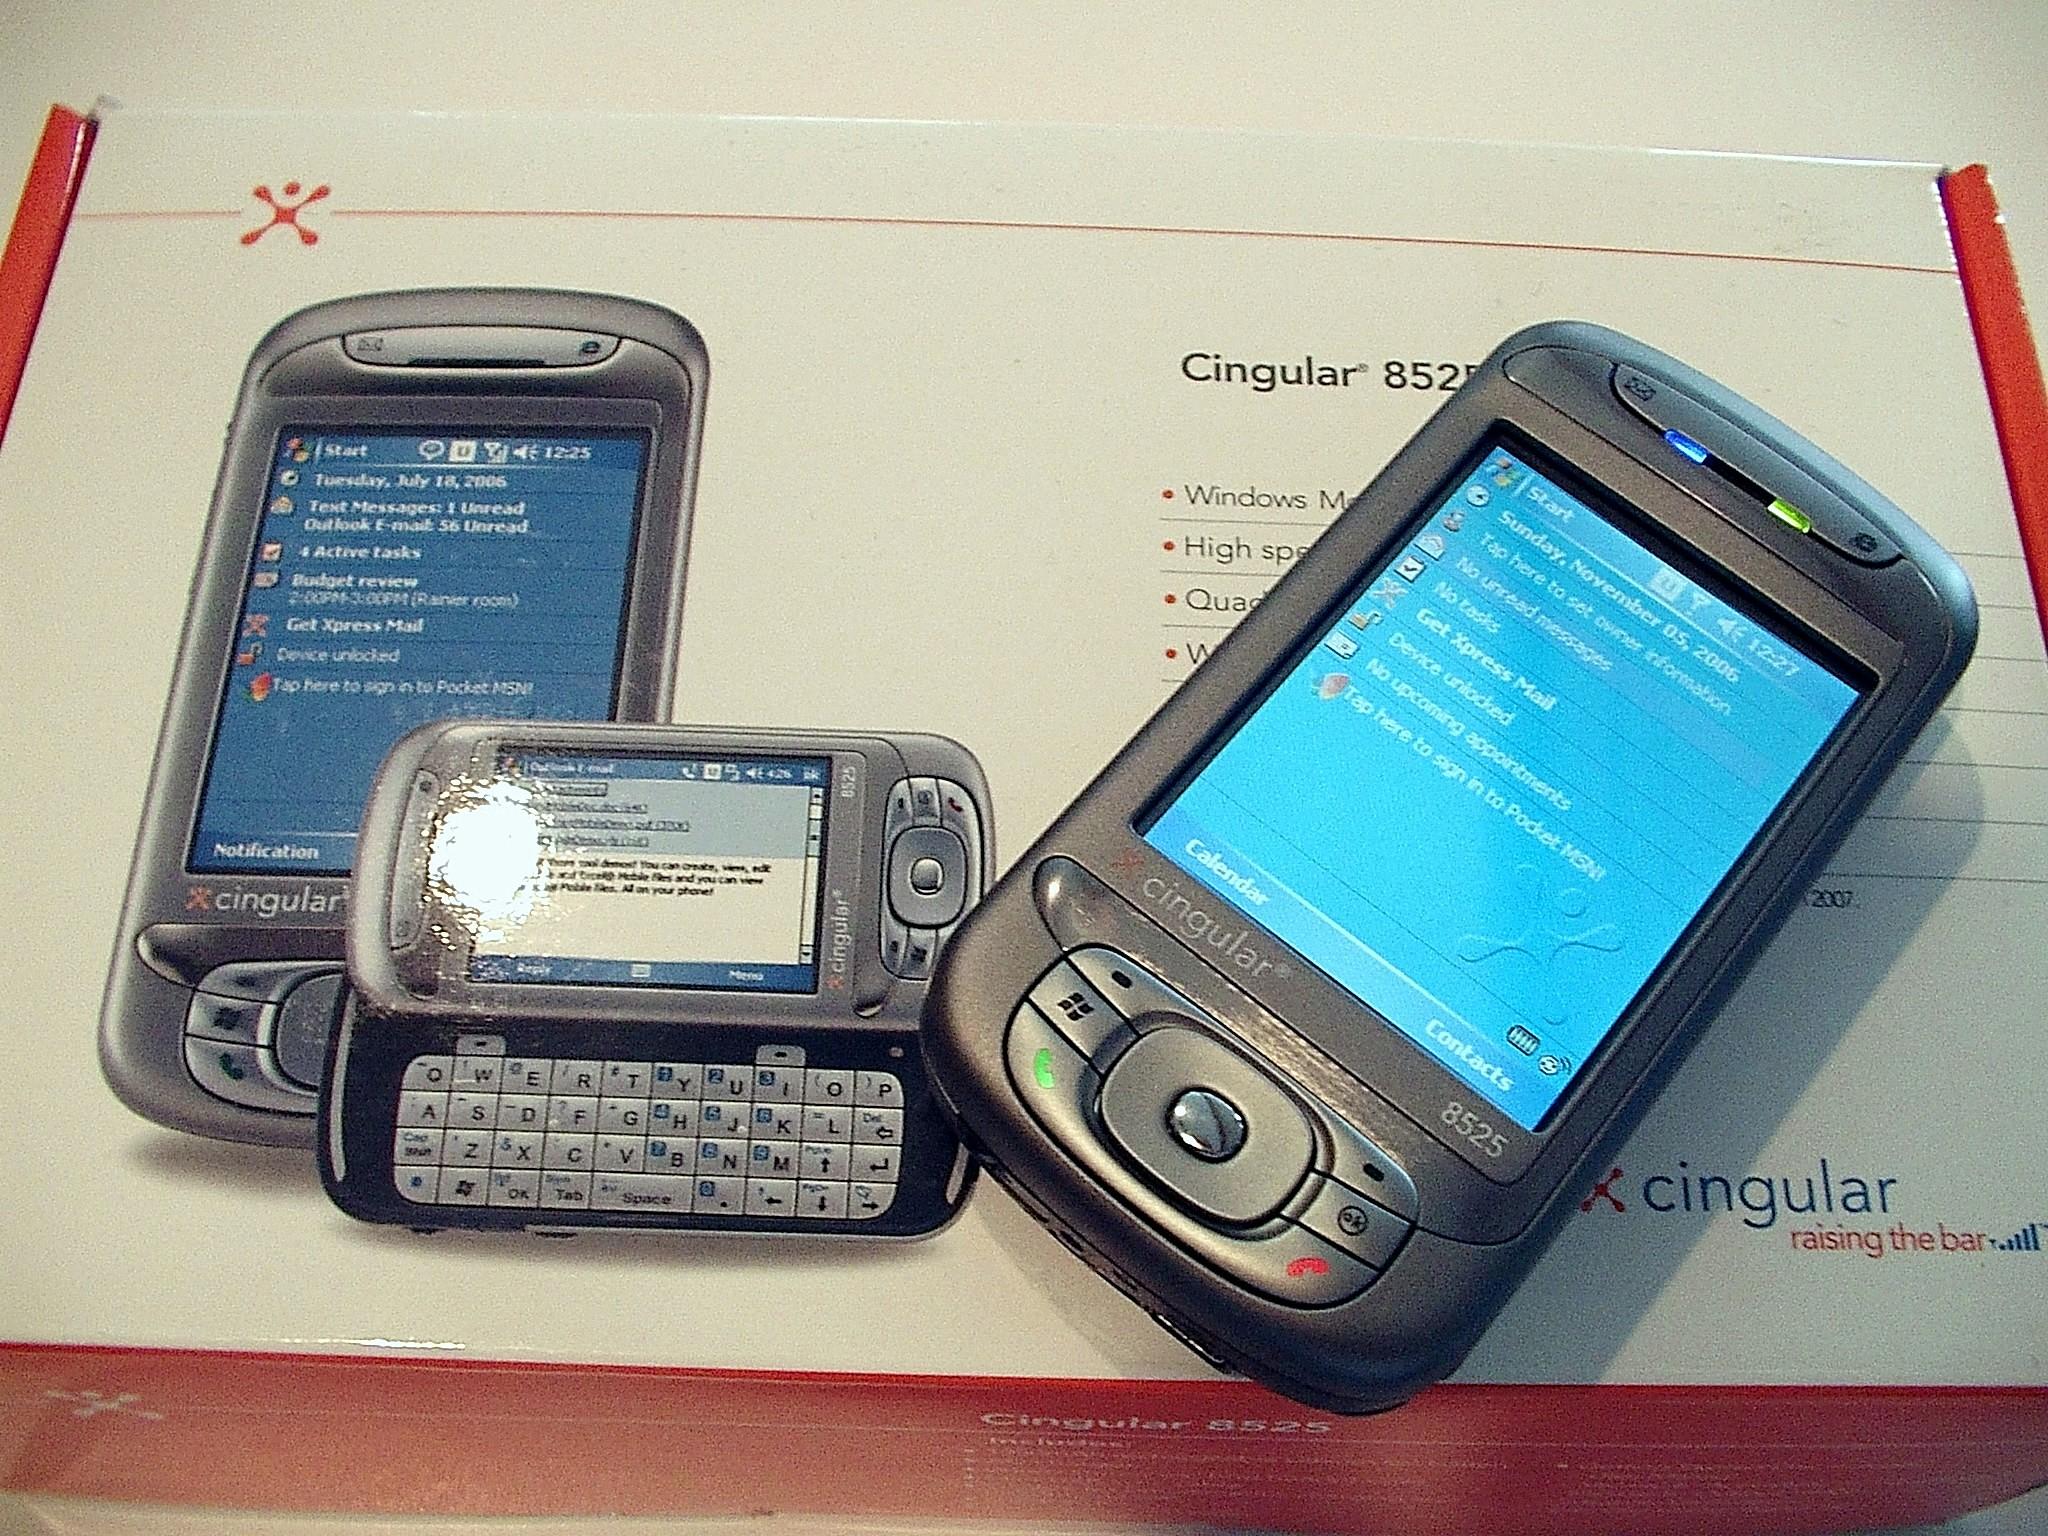 Verizon Versus Cingular Wireless Phones